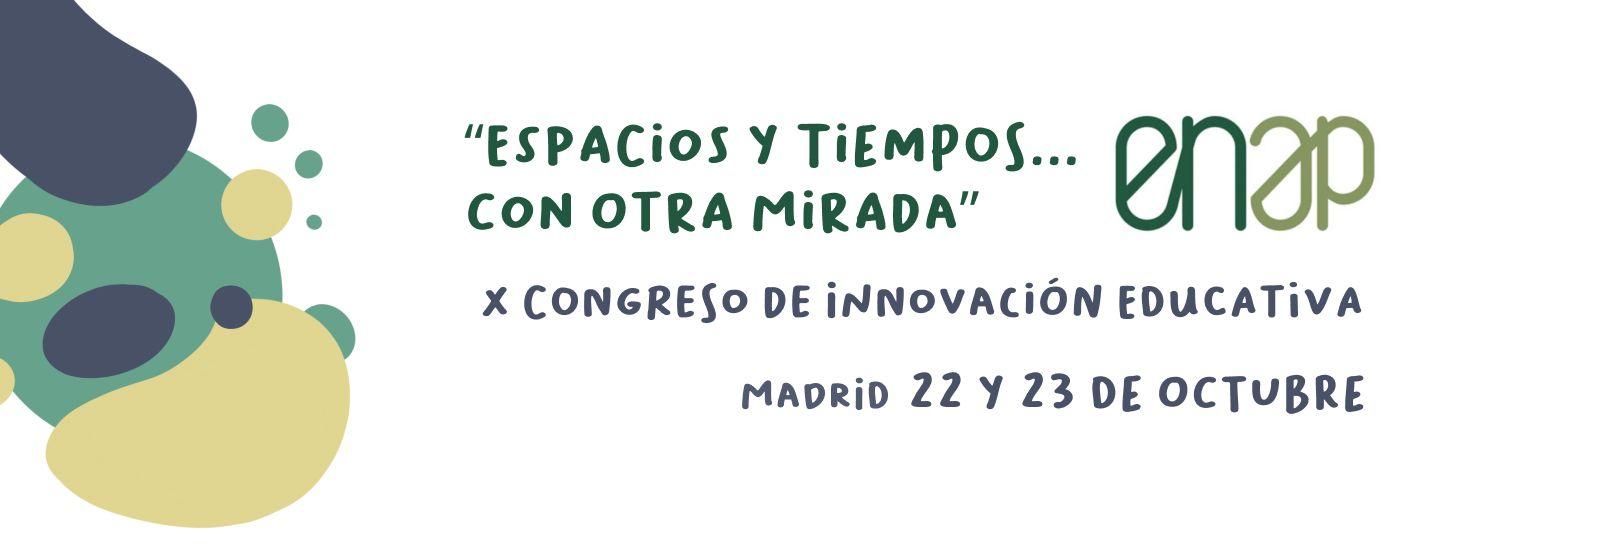 Fotografia X Congreso de Innovación Educativa